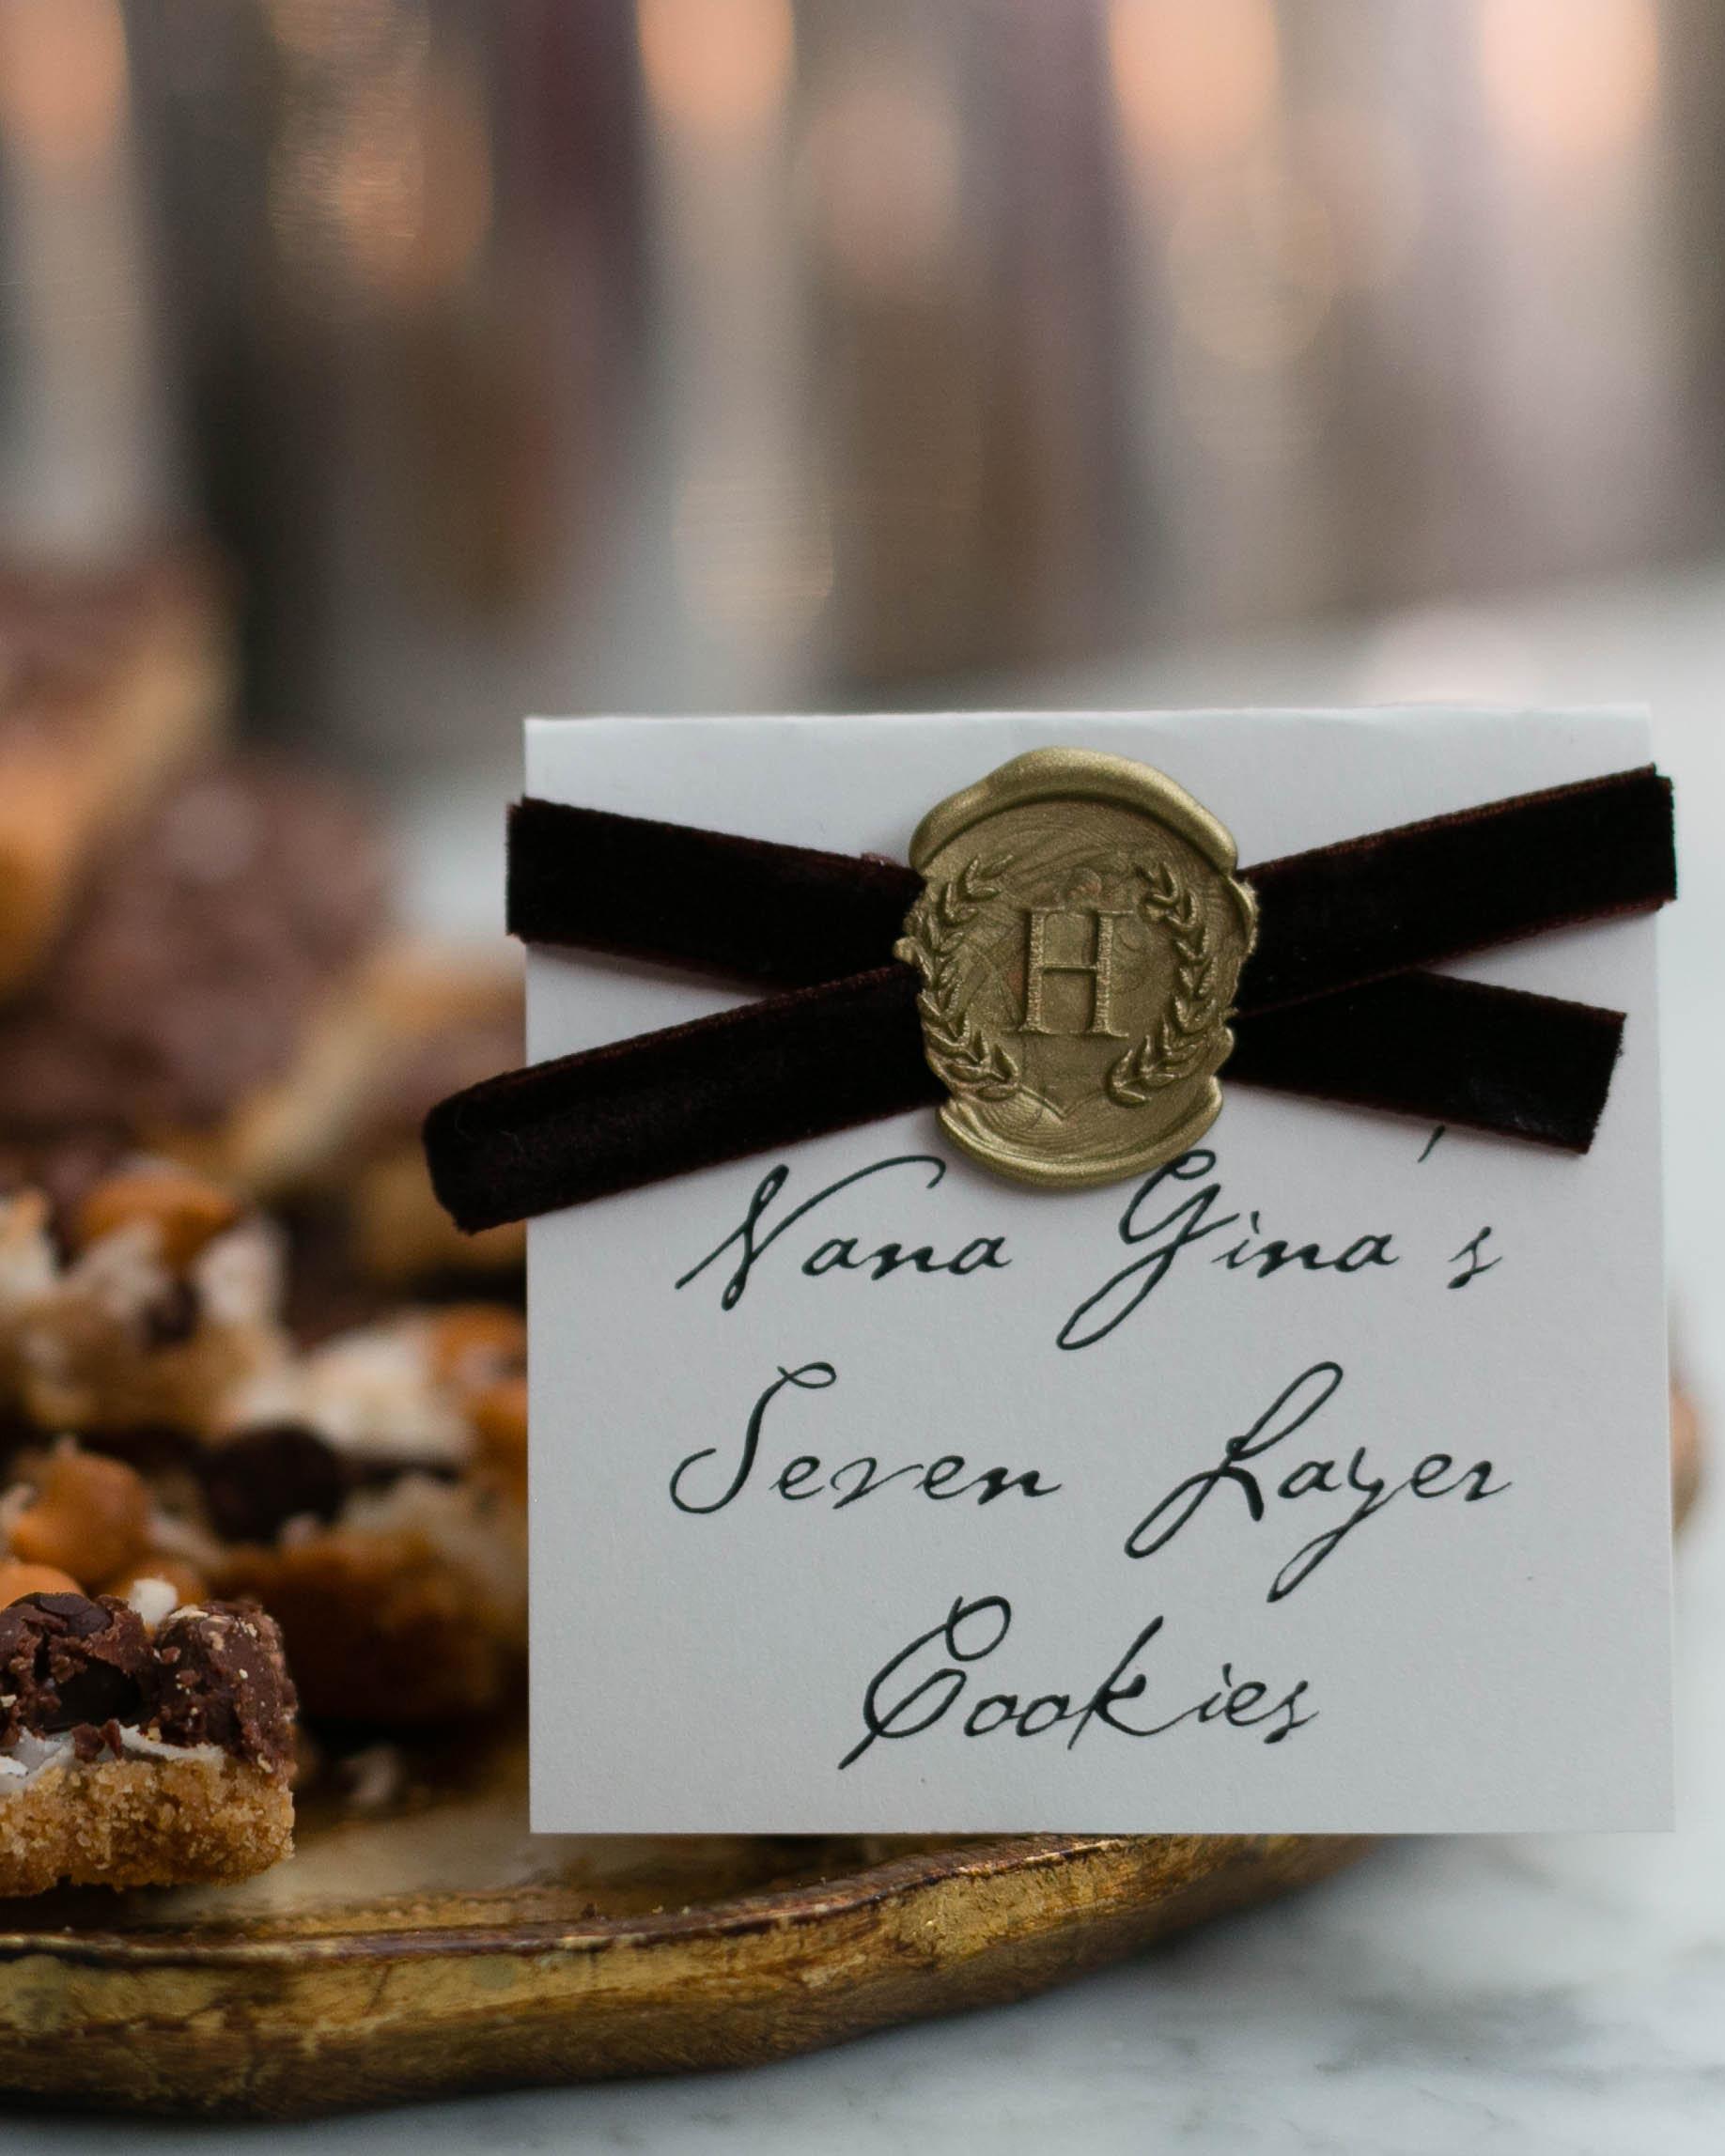 bianca-bryen-wedding-desserts-641-s112509-0216.jpg